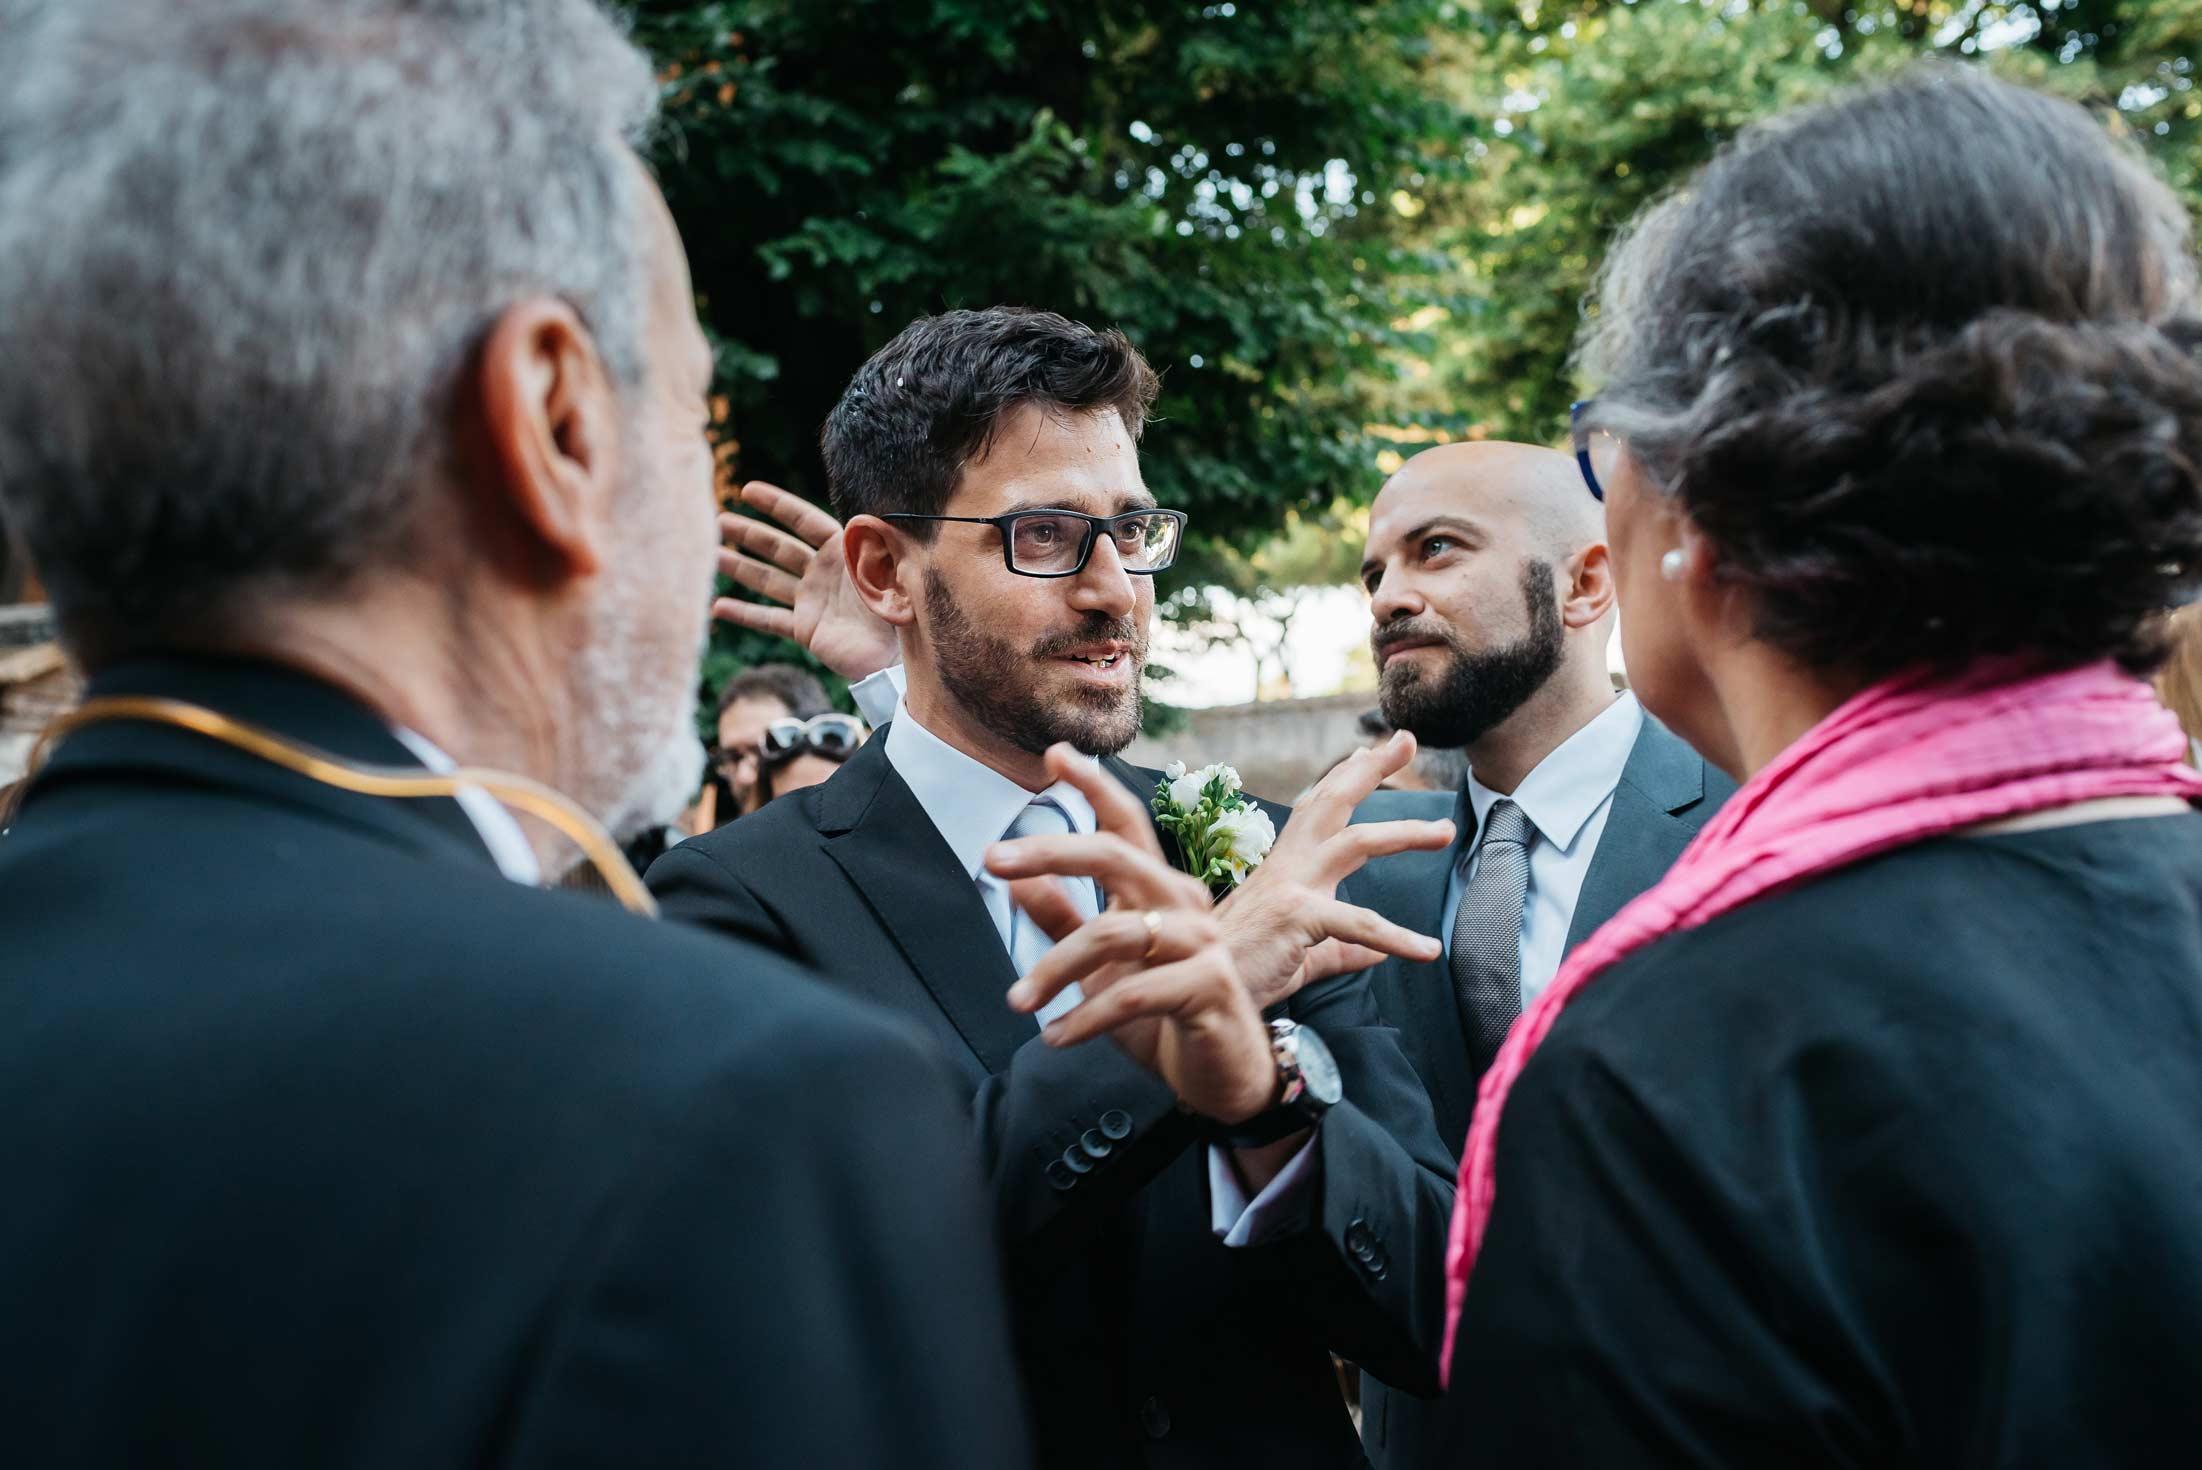 Wedding-Photographer-in-Italy-Wedding-in-Rome-Ceremony